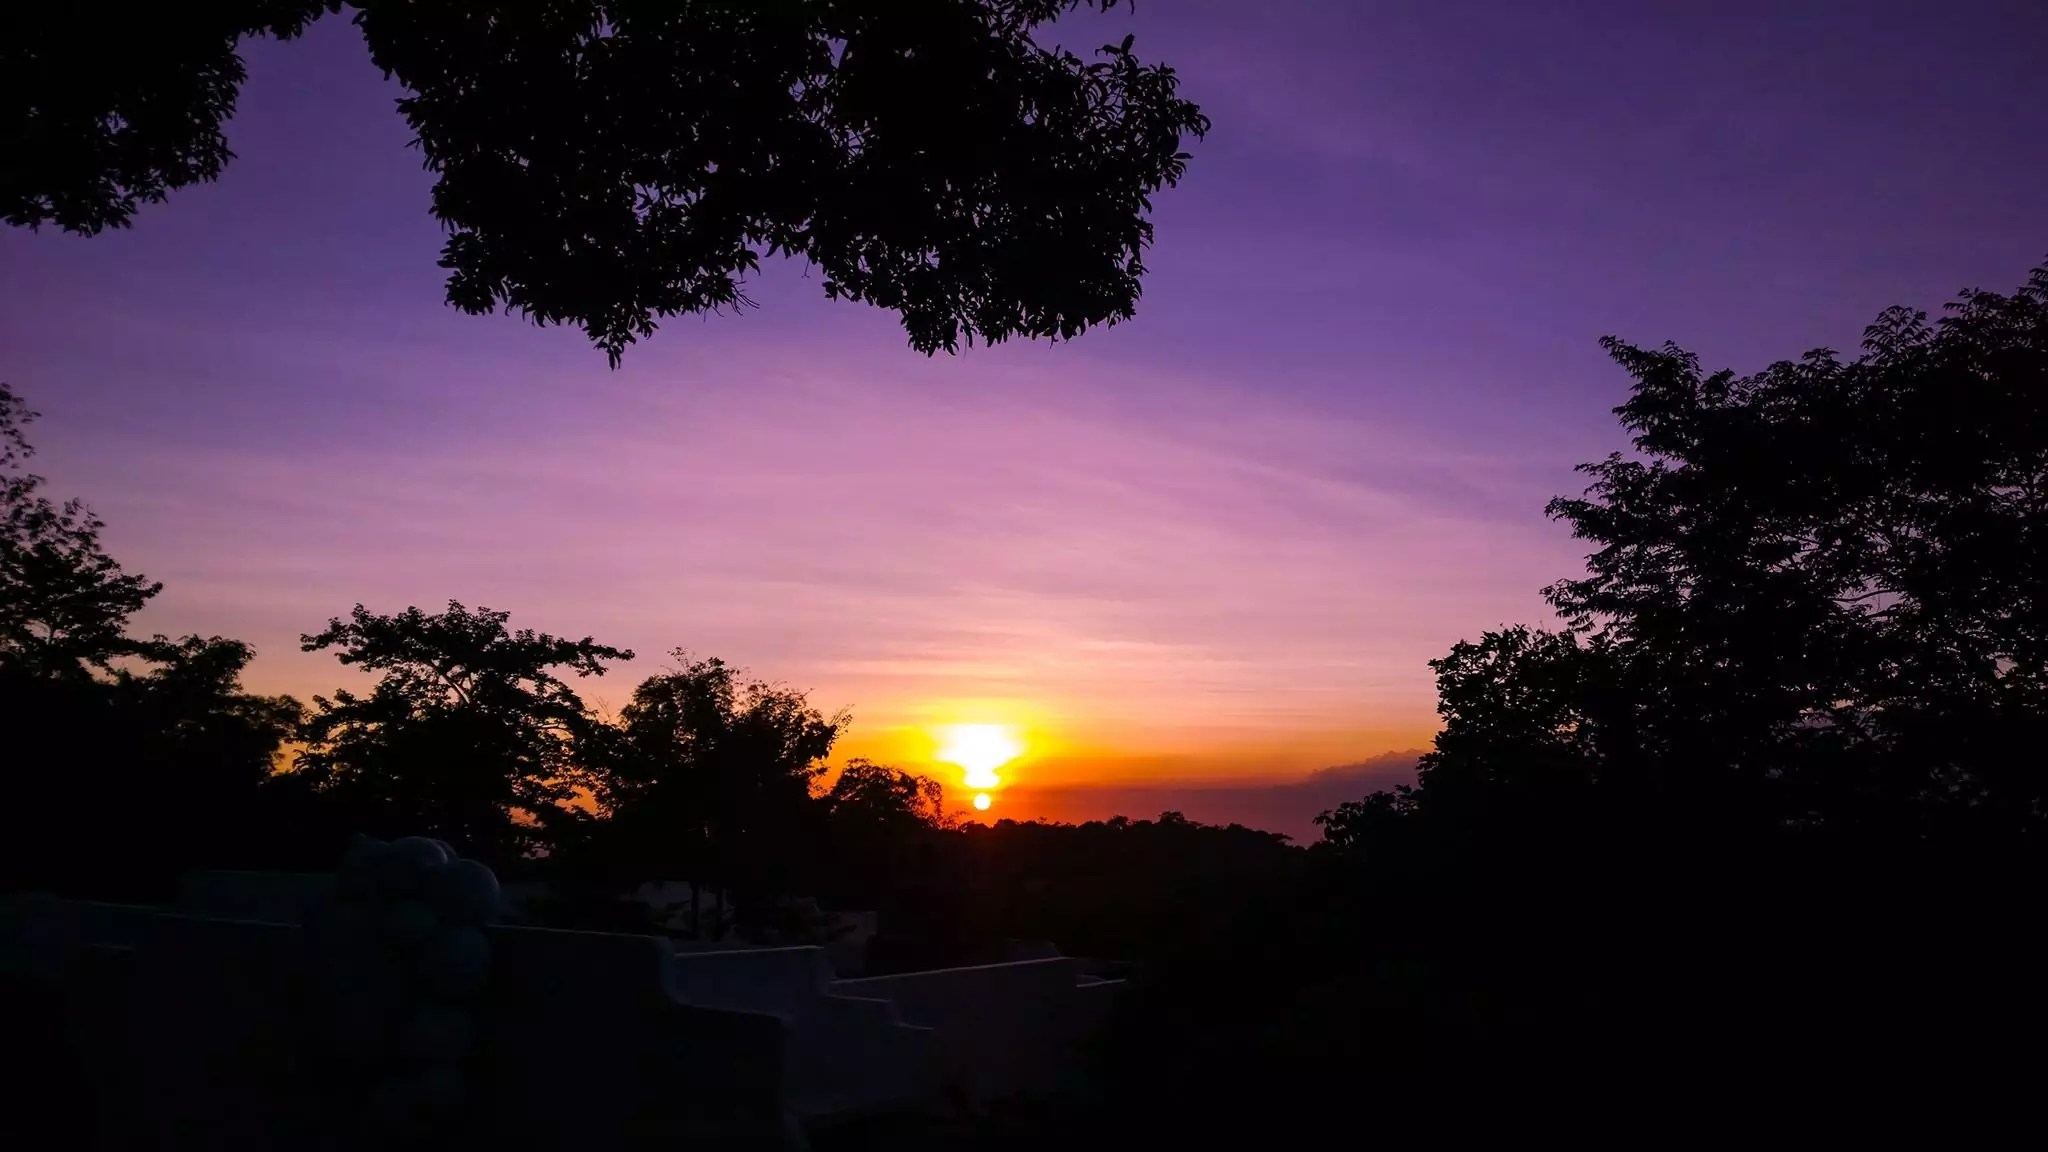 Sunset in Antipolo City - photo by Carmela Sarsora under Pexels License